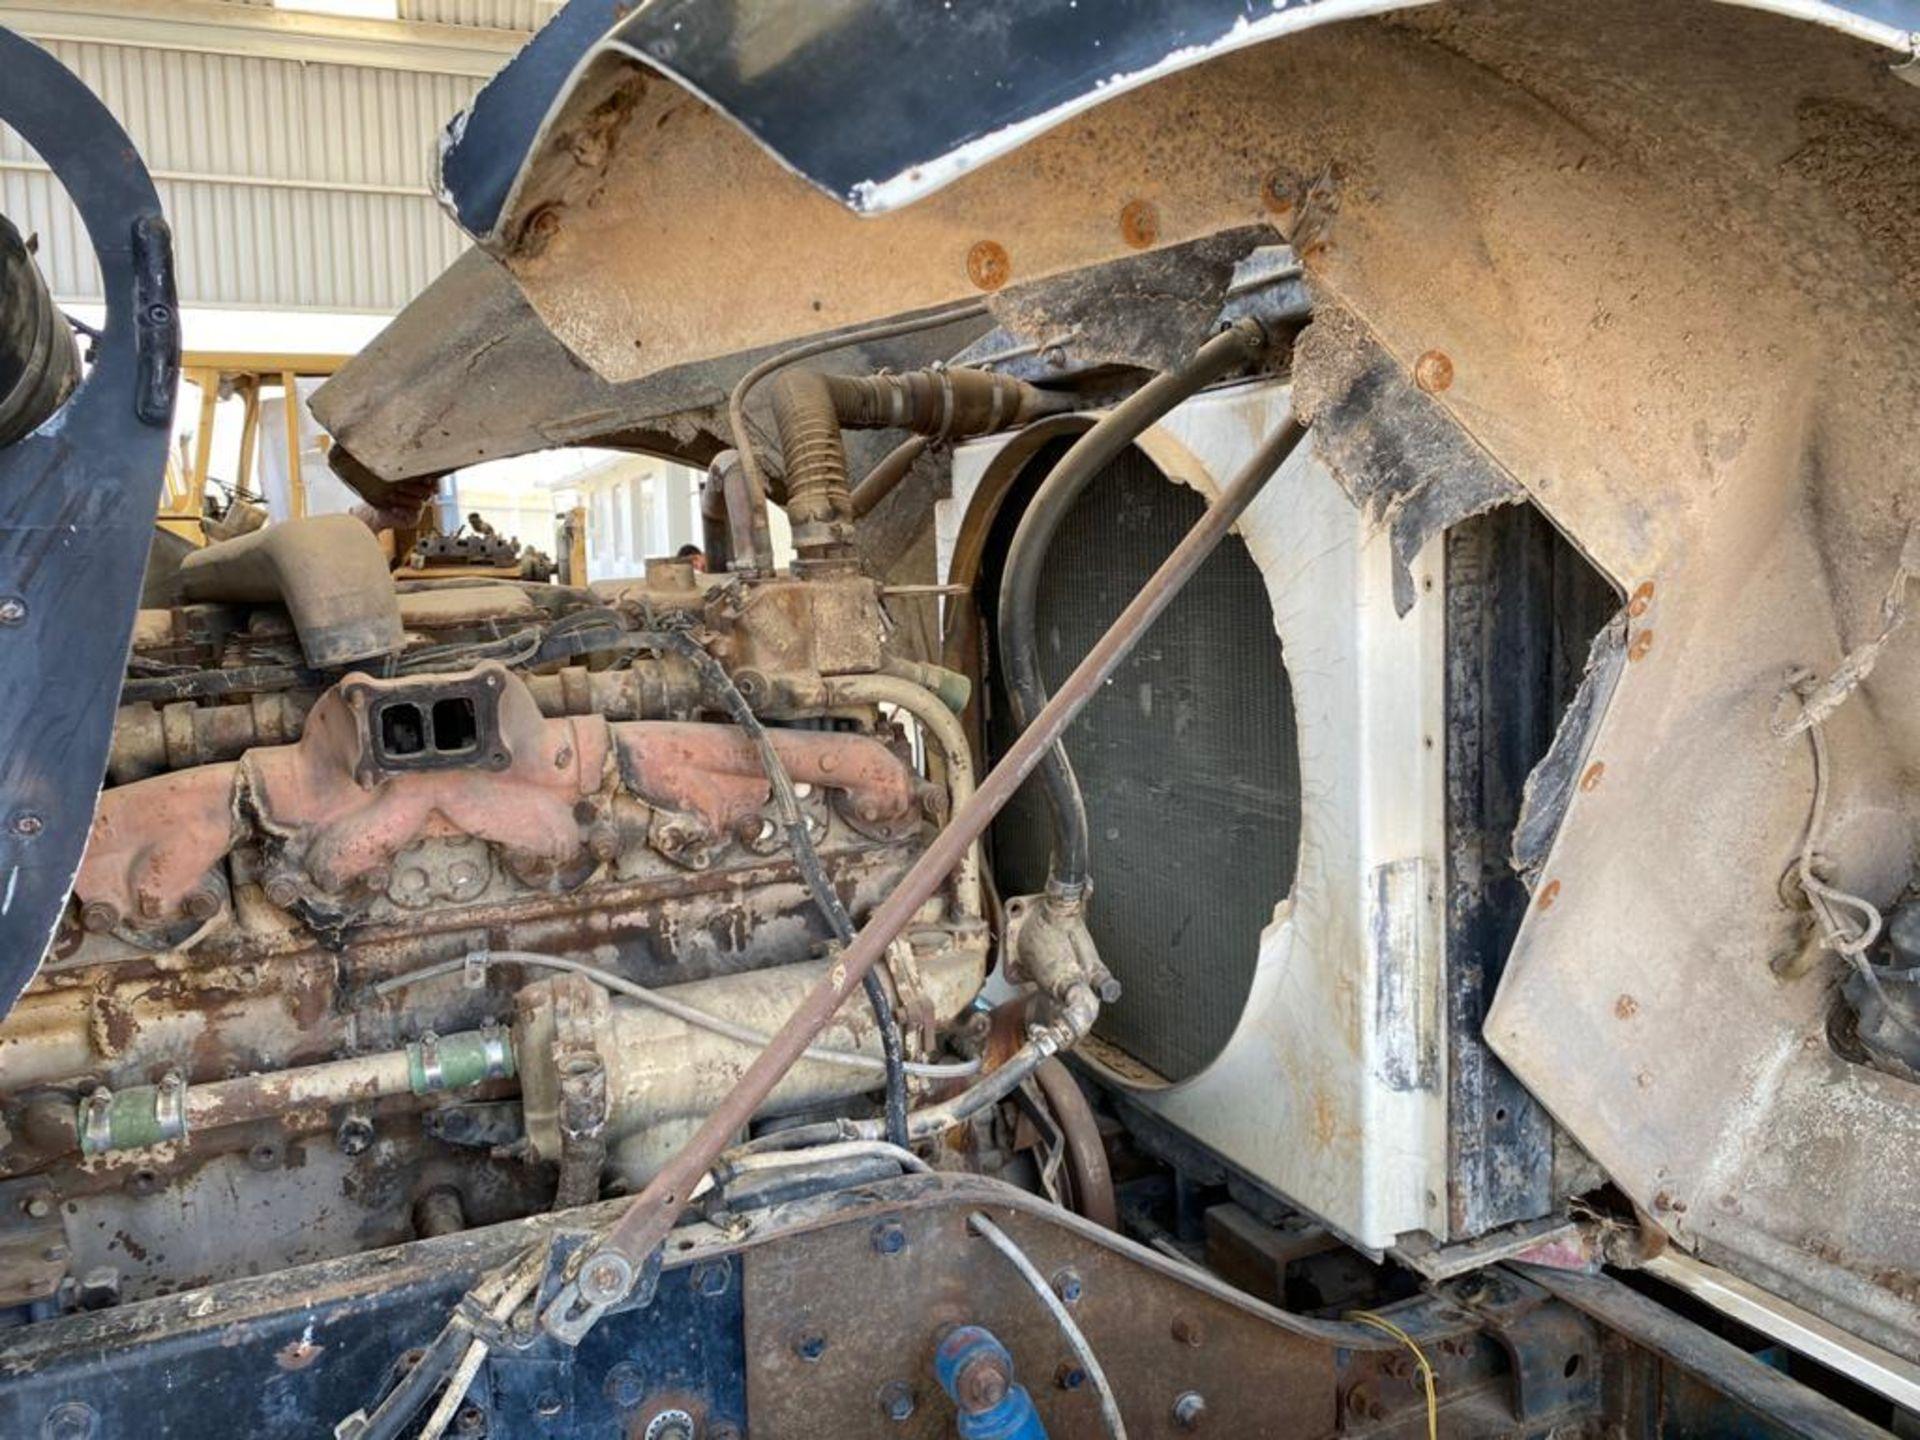 1983 Kenworth Dump Truck, standard transmission of 10 speeds, with Cummins motor - Image 34 of 68